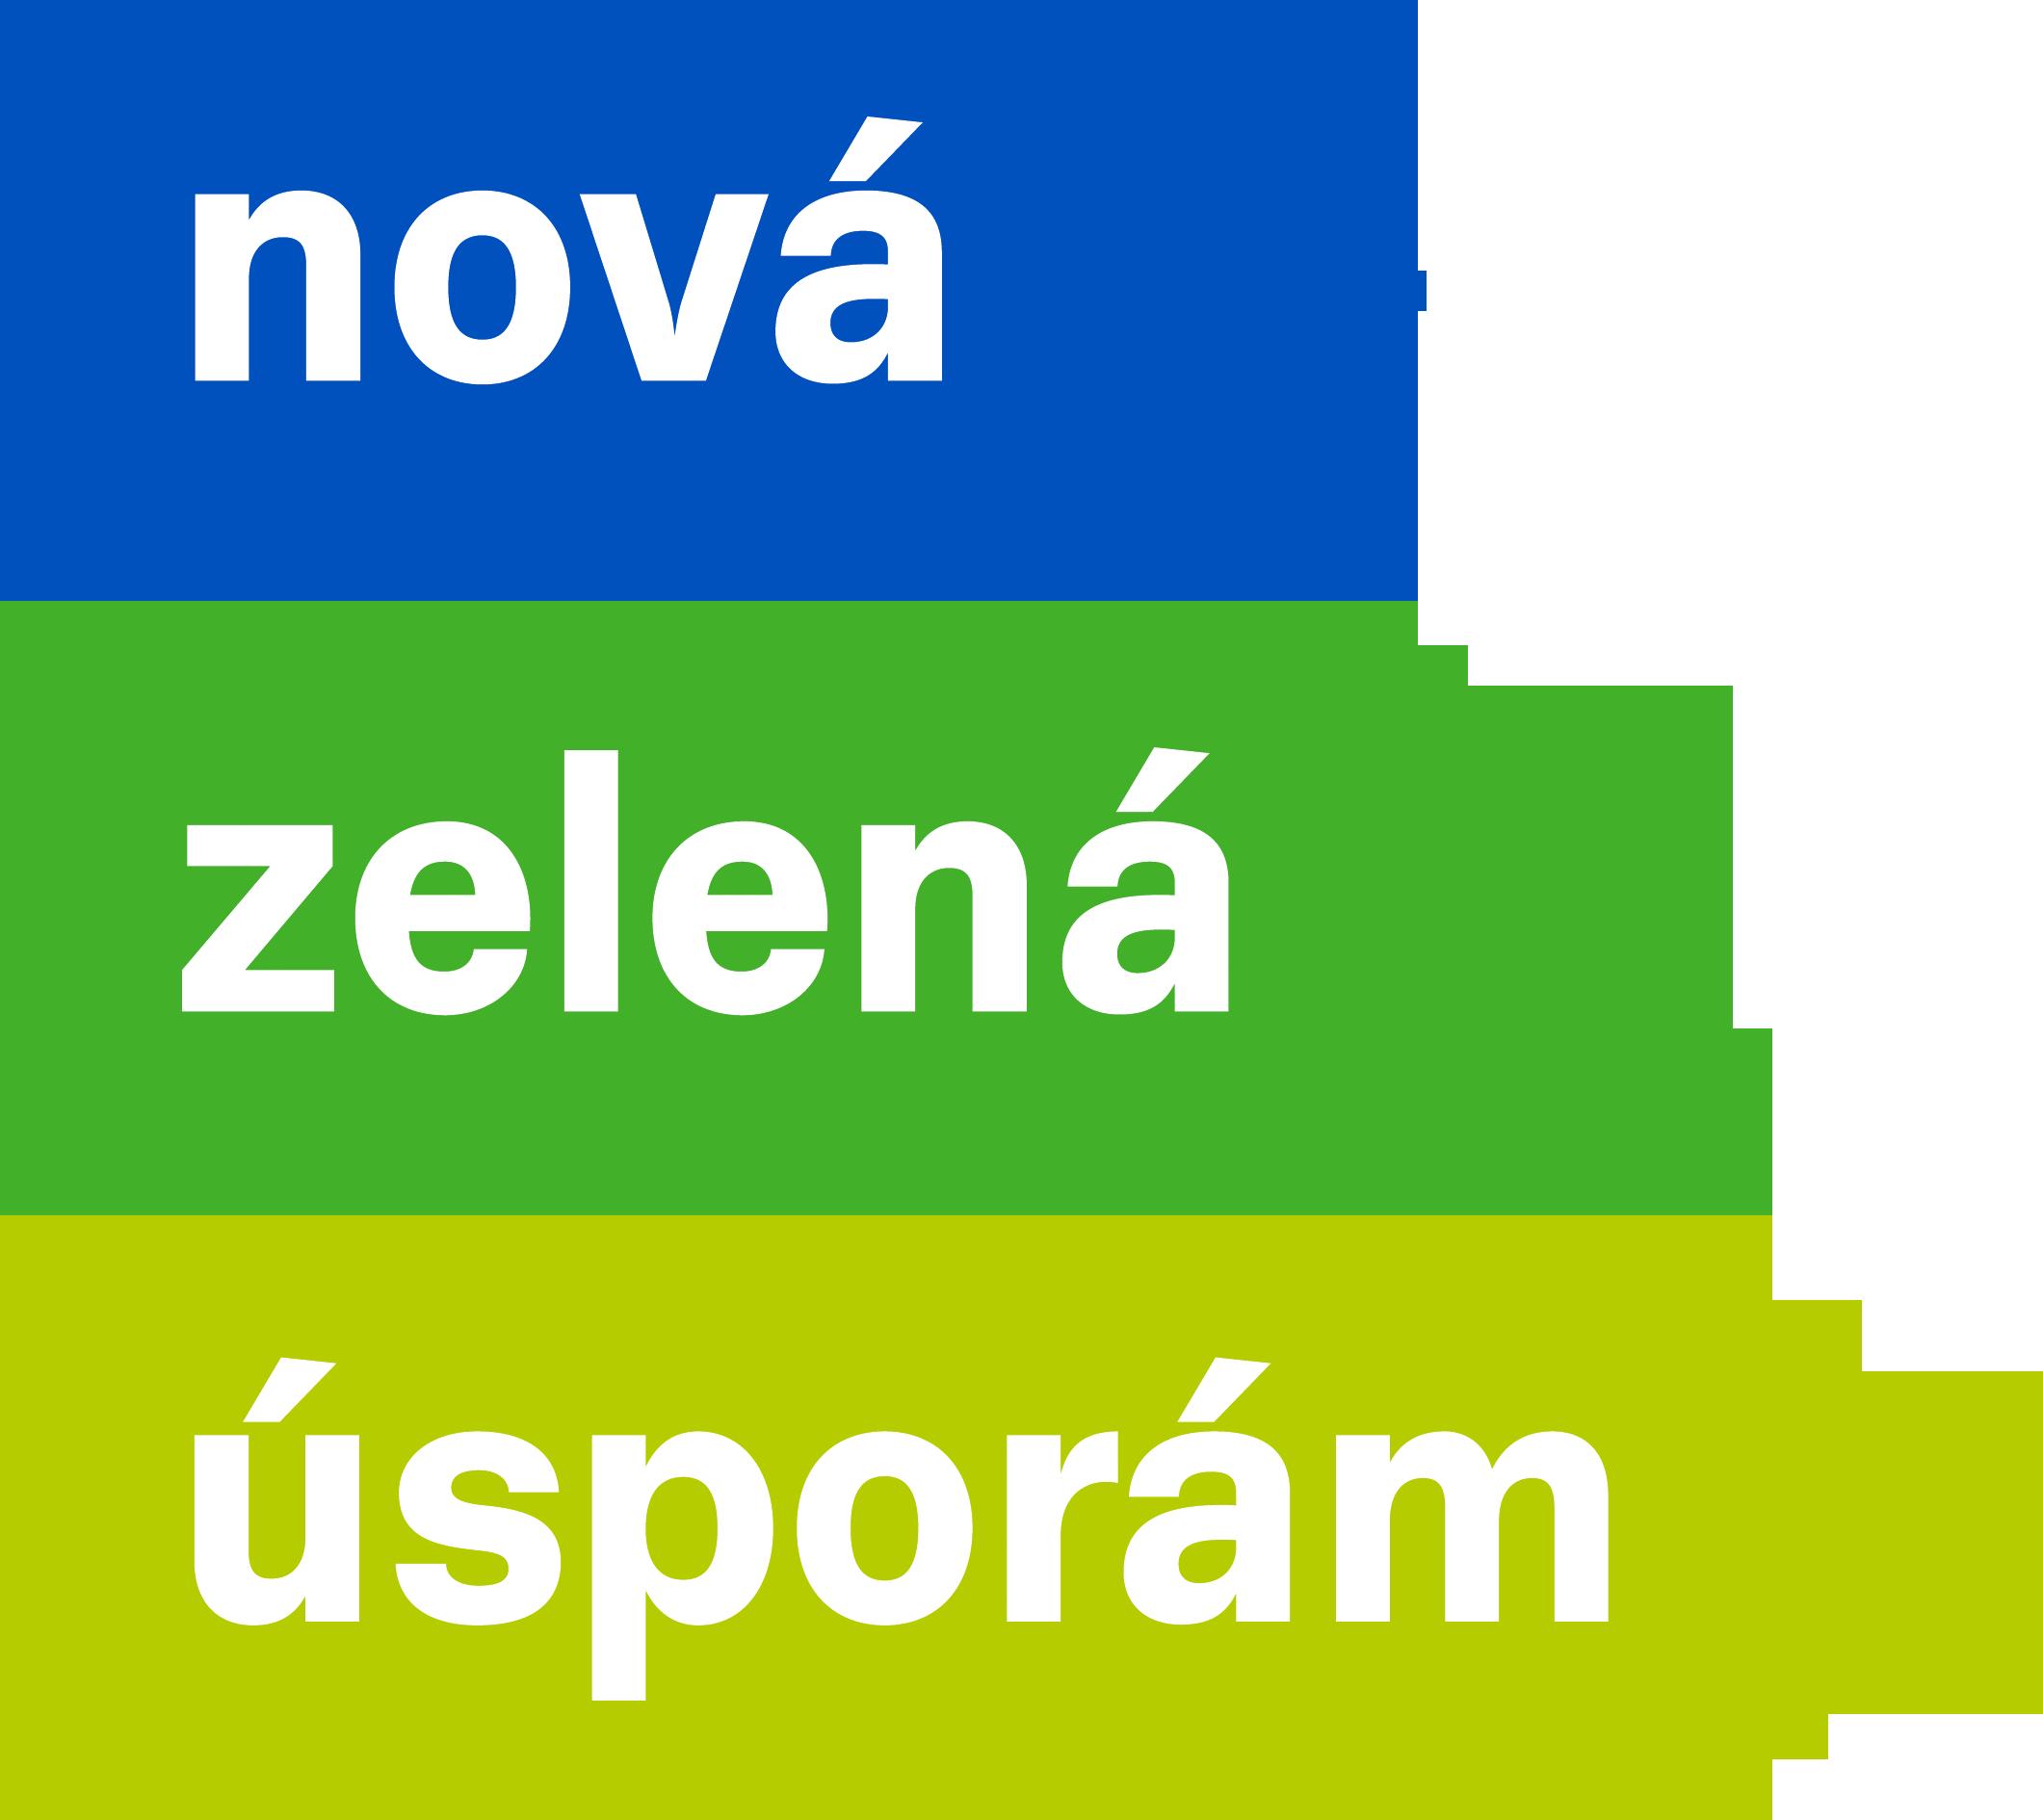 zelena usporam zakladni varianta lg